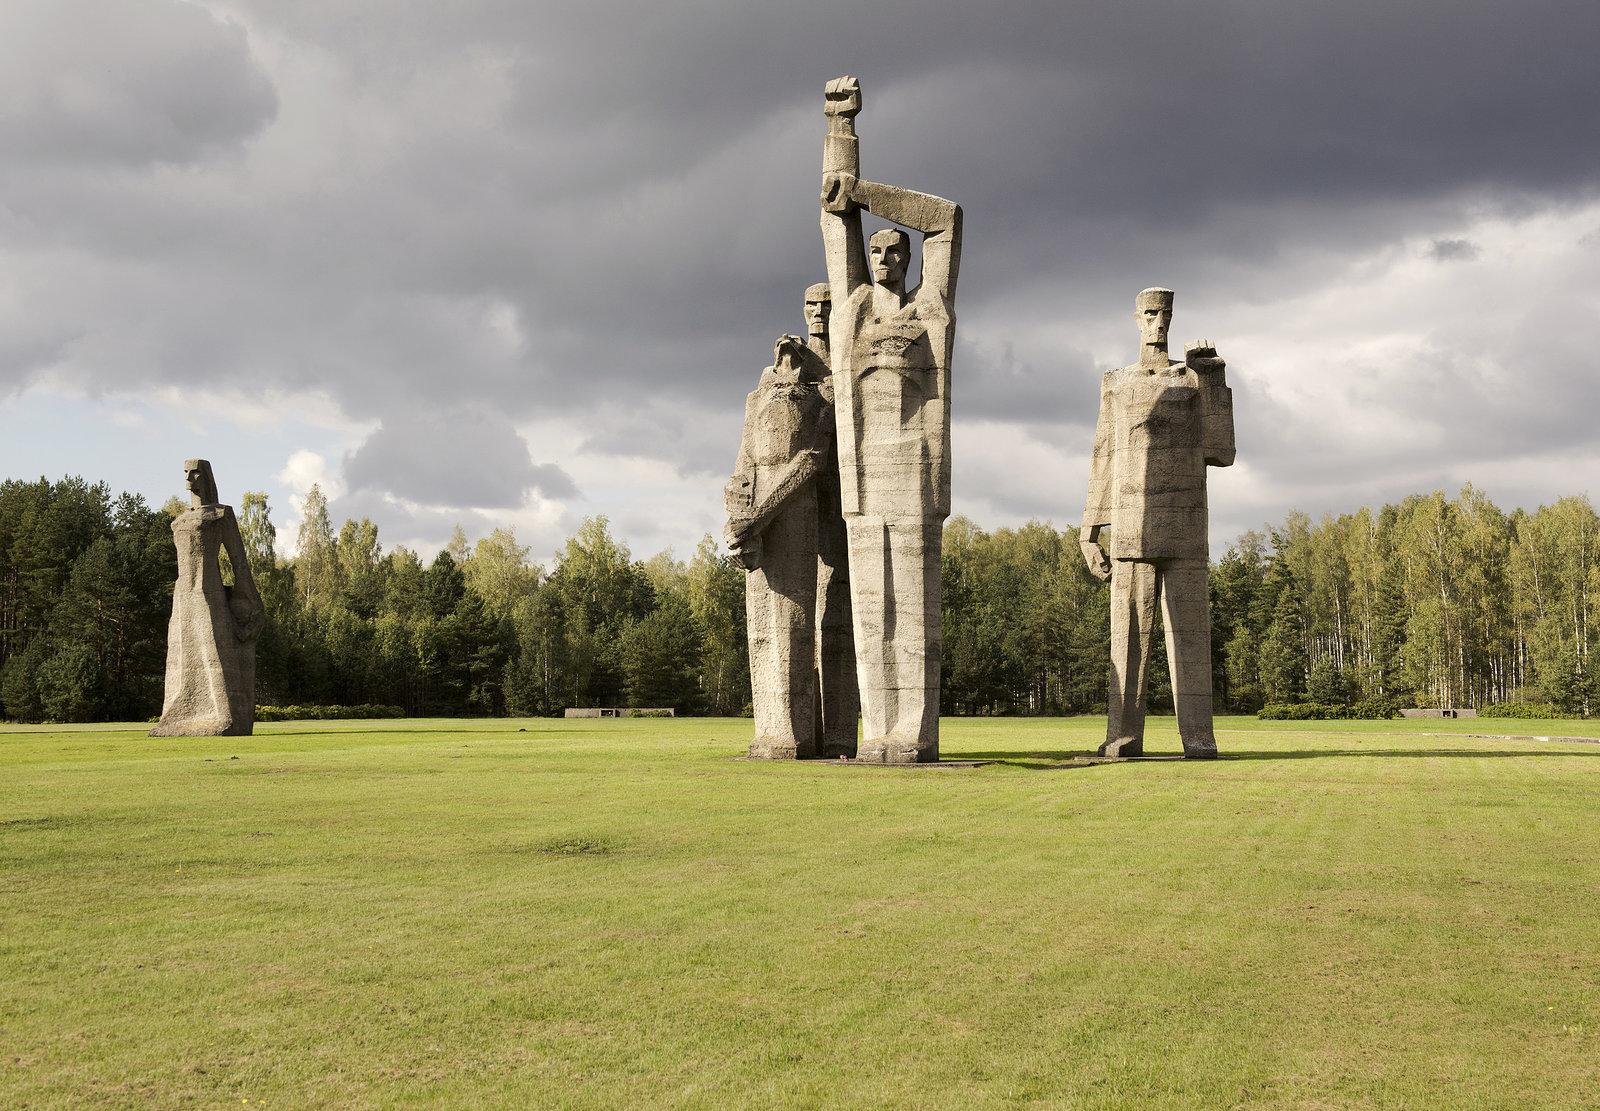 Salaspils Memorial Ensemble, Riga, Latvia